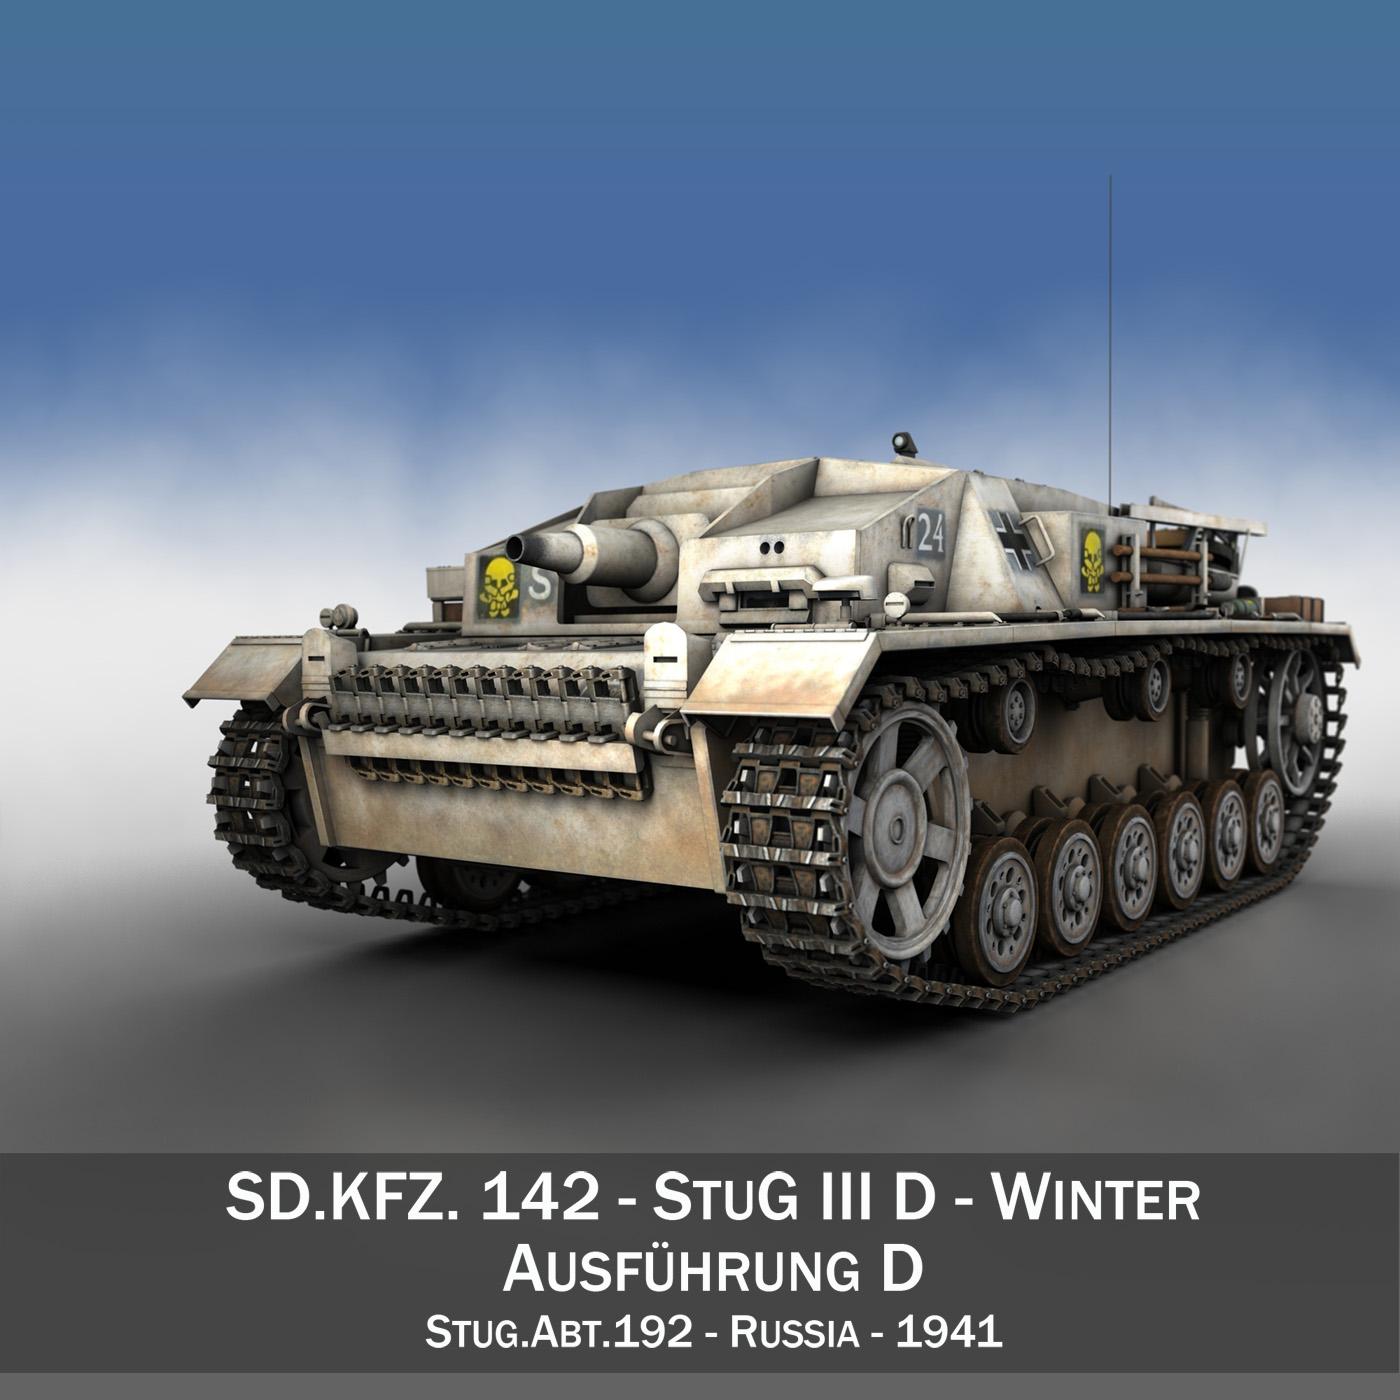 stug iii – ausf.d – stug abt 192 – winter camo 3d model 3ds fbx lwo lw lws obj c4d 265221